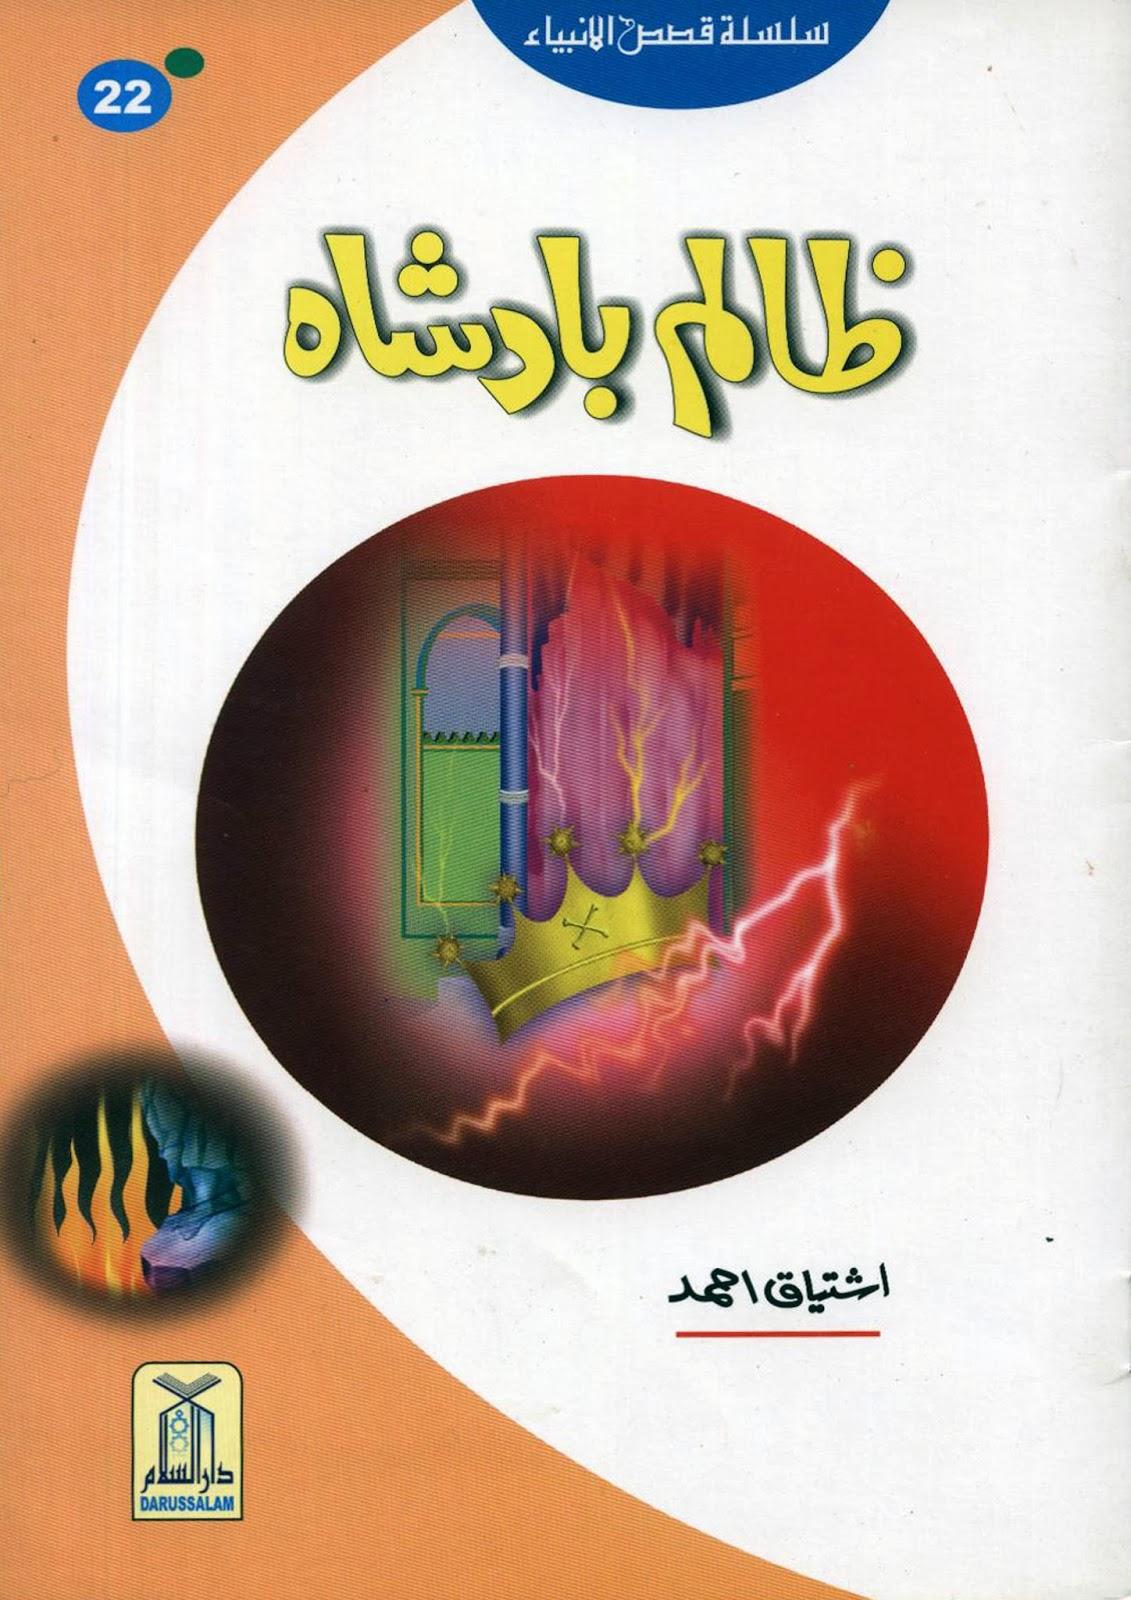 http://urduguru1.blogspot.com/2014/03/zalam-badsh-alyas-prophet-yase-zulkifli.html